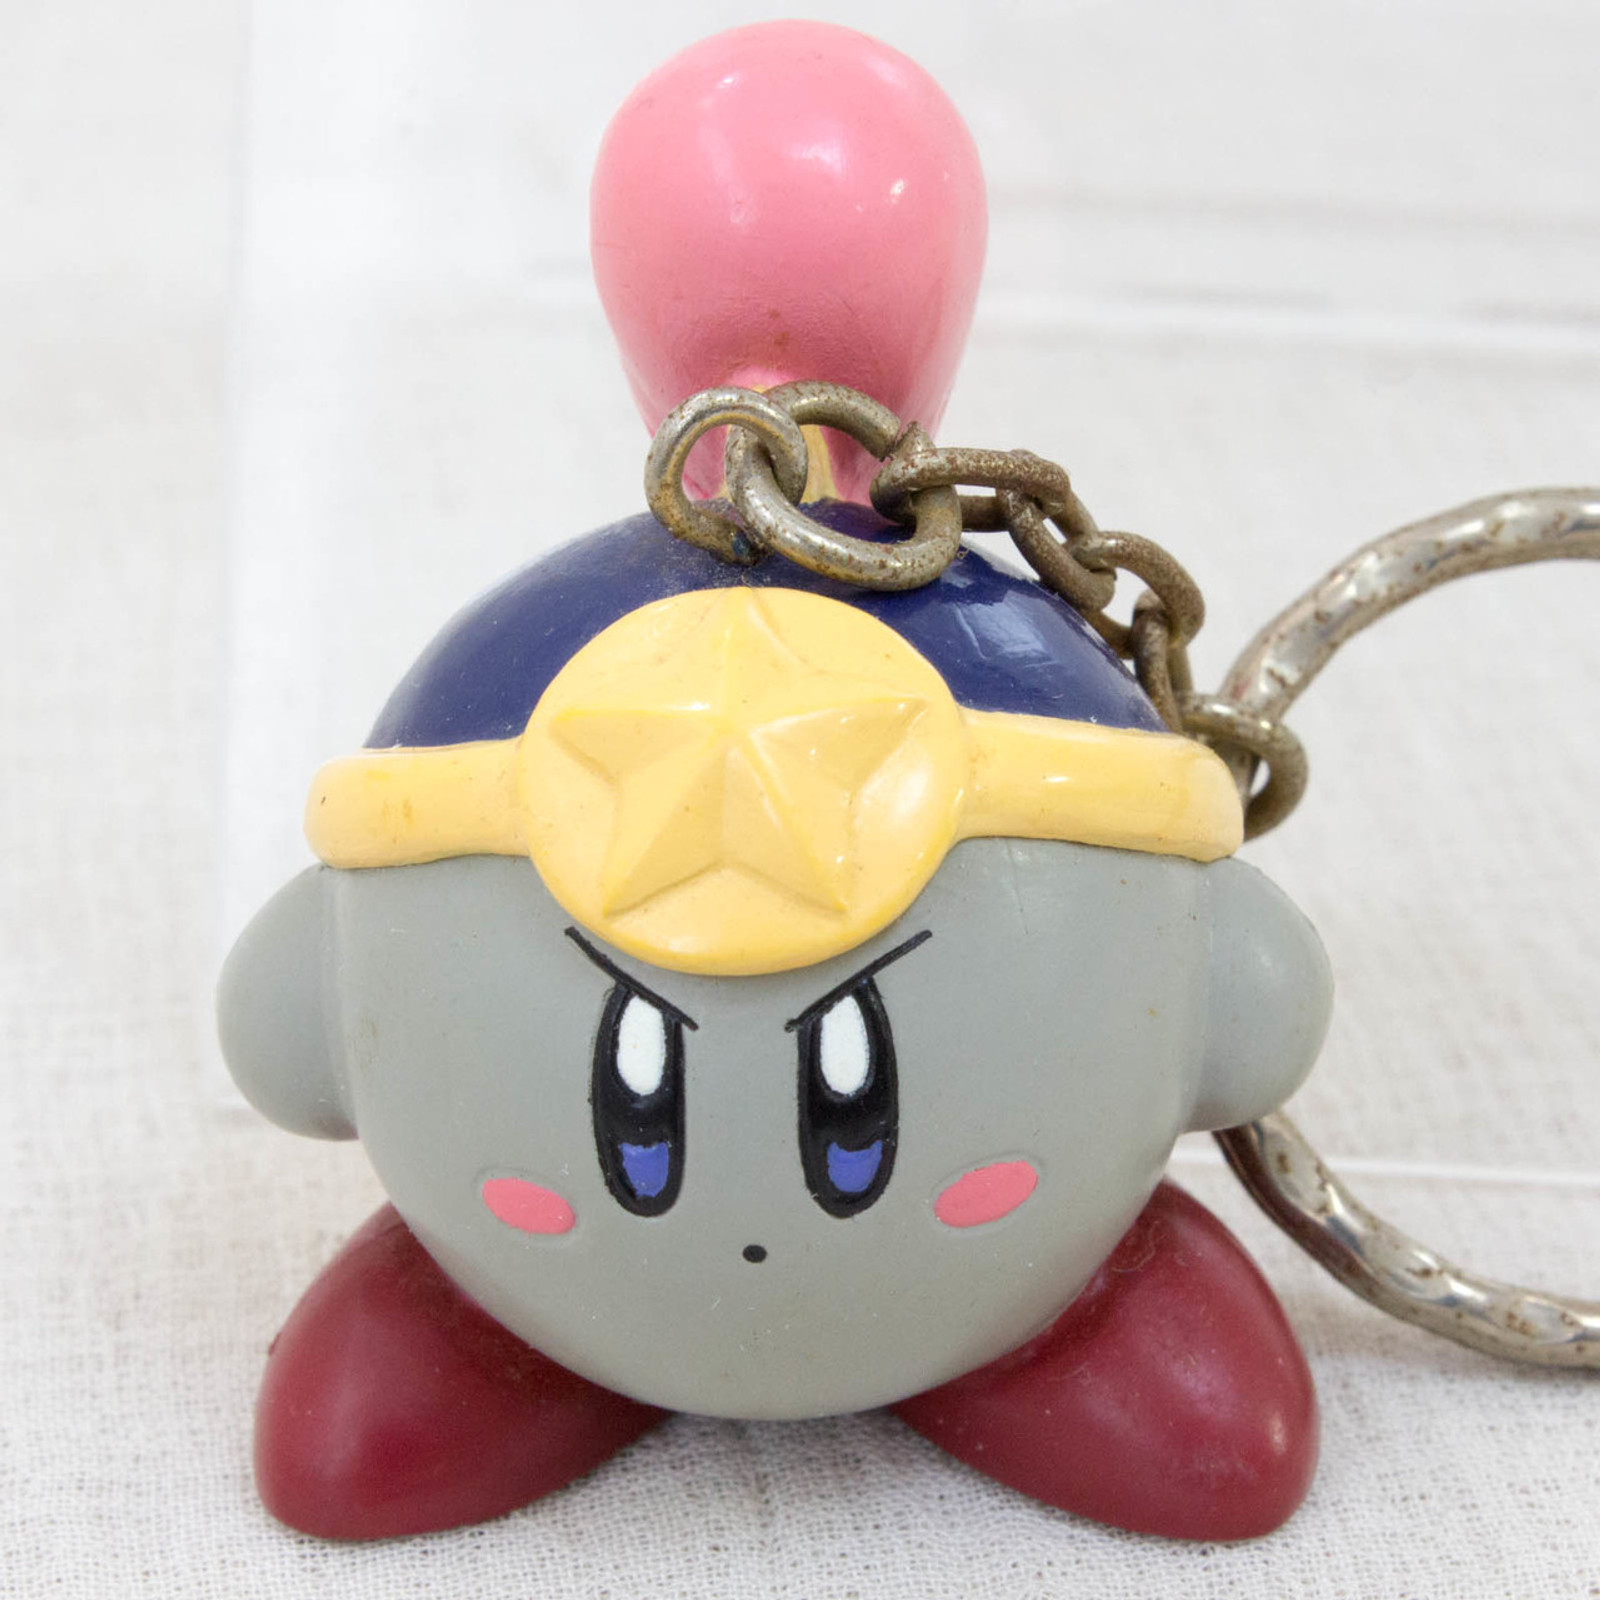 Retro Rare! Kirby Super Star Figure Key Chain NINTENDO JAPAN GAME 2